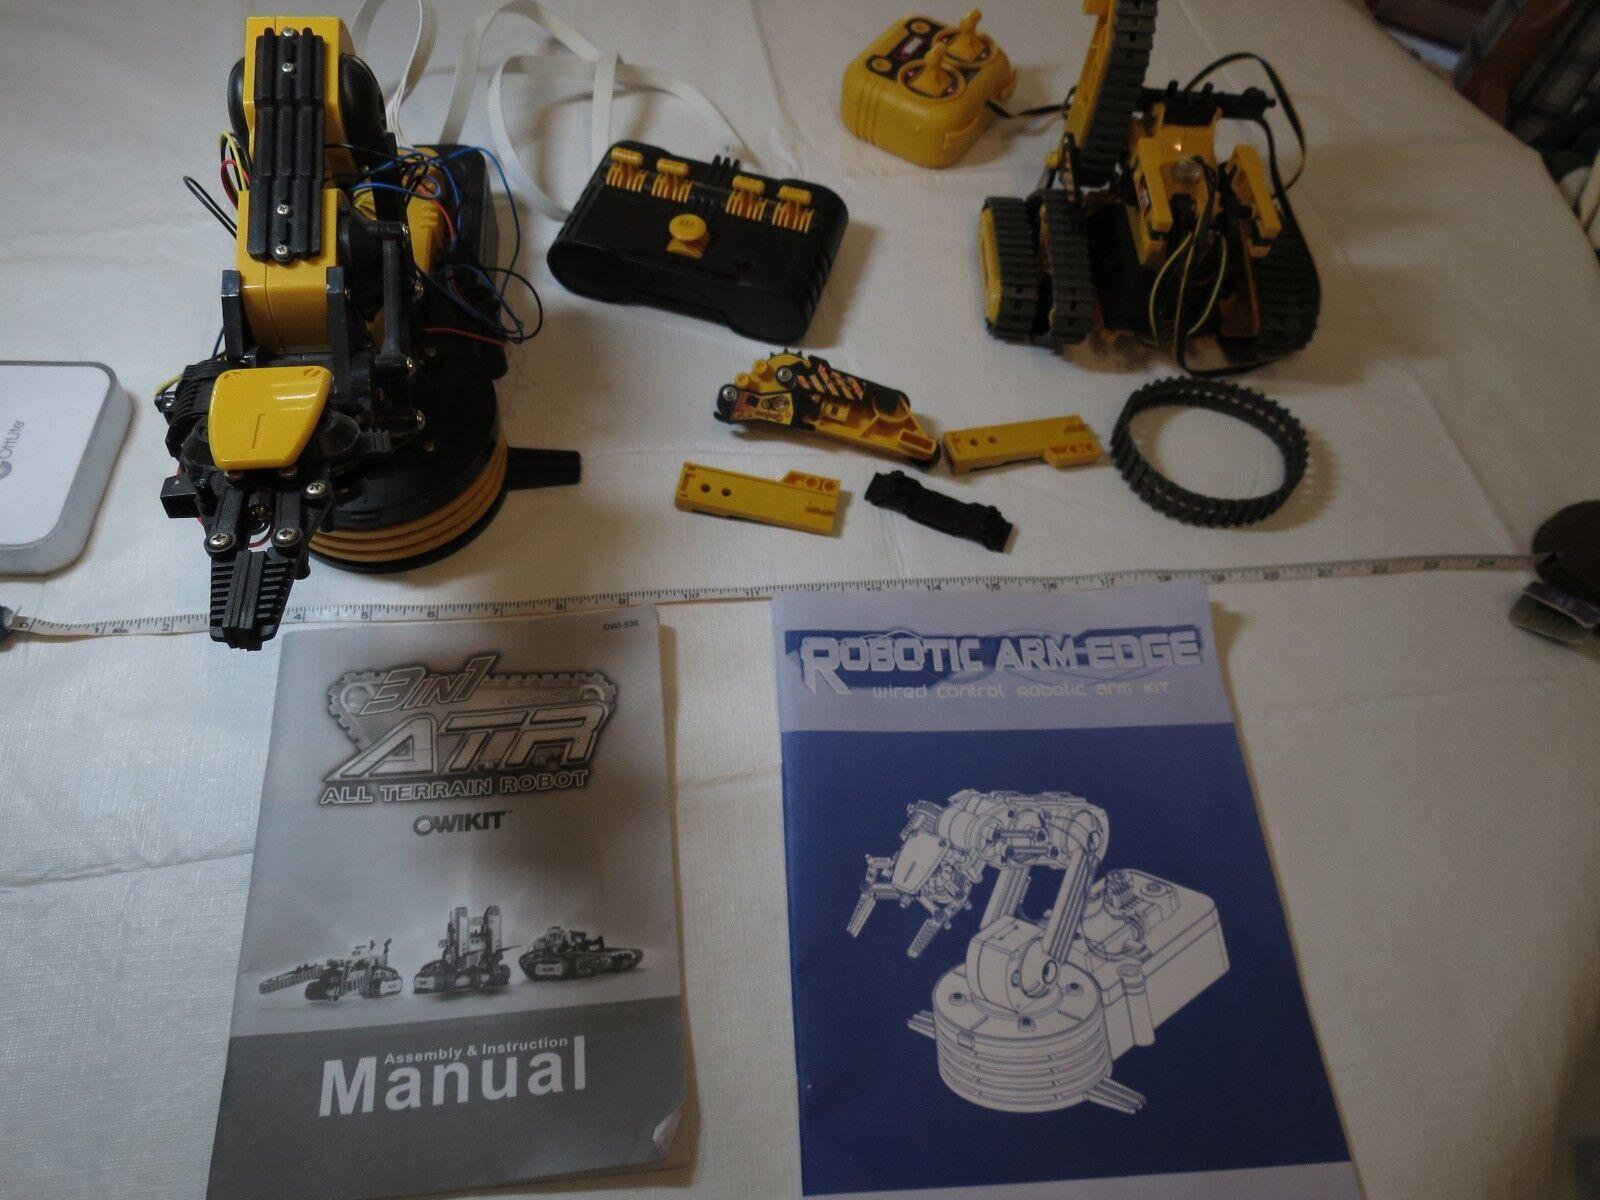 Brazo robótico-Edge Brazo De Control Con Cable Kit de 3 en 1 ATR Todo Terreno Robot owikit Lote